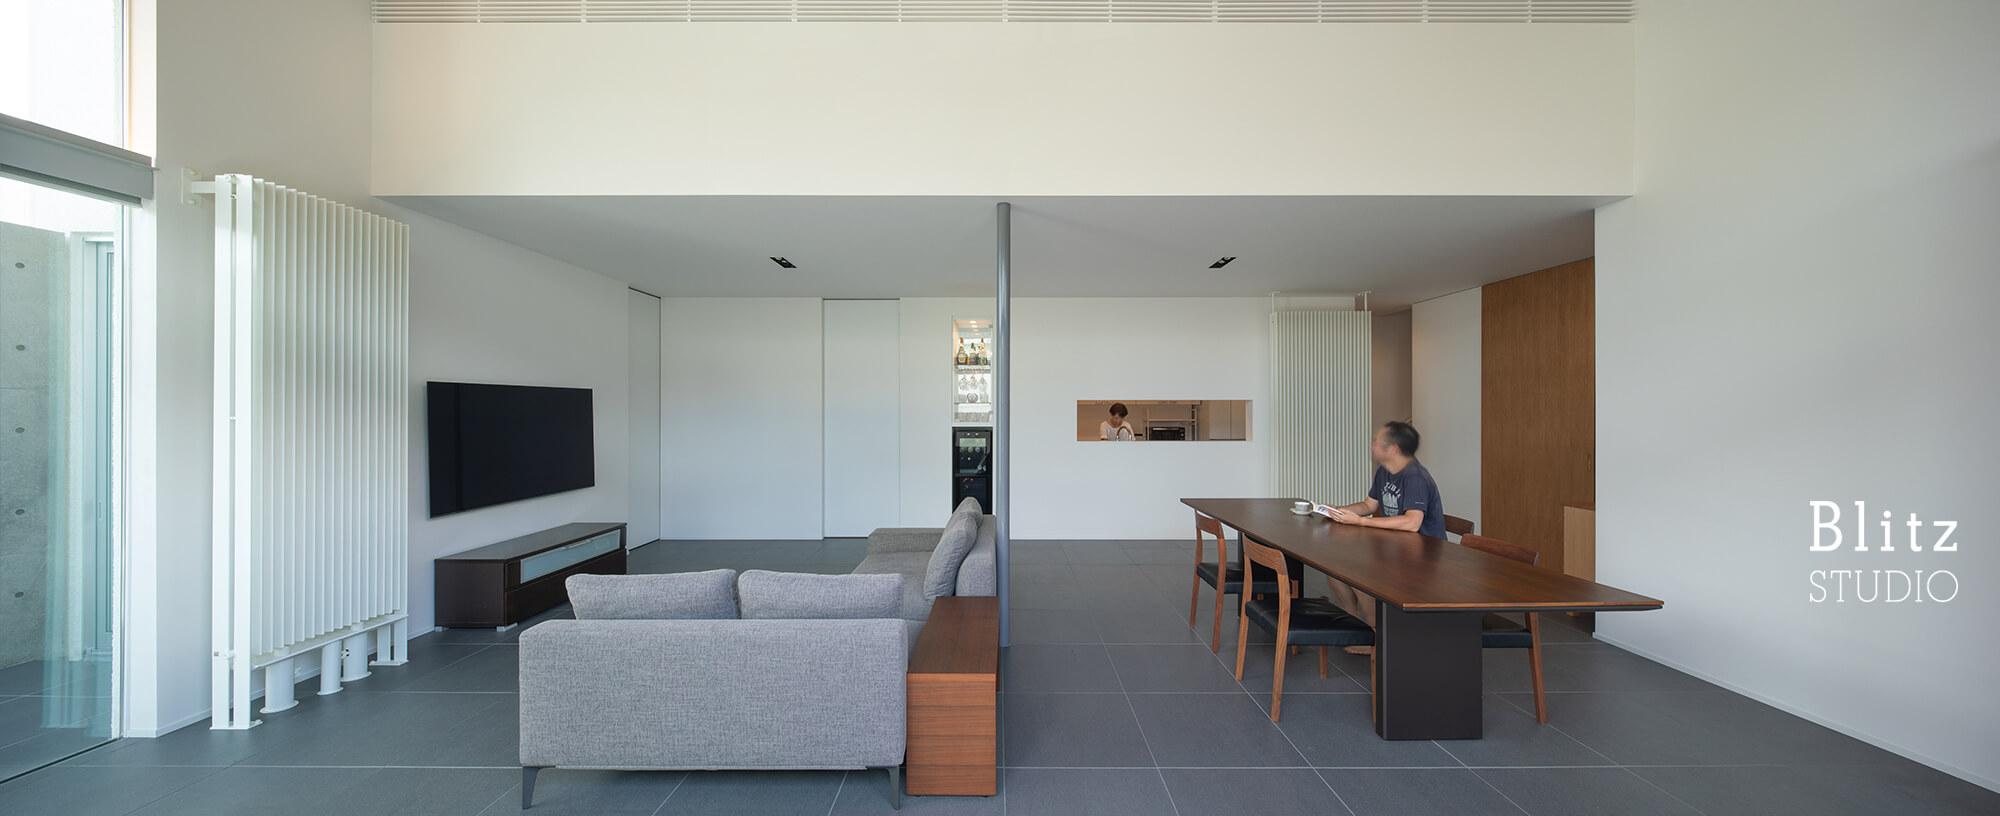 『SA House』-熊本県熊本市-建築写真・竣工写真・インテリア写真4